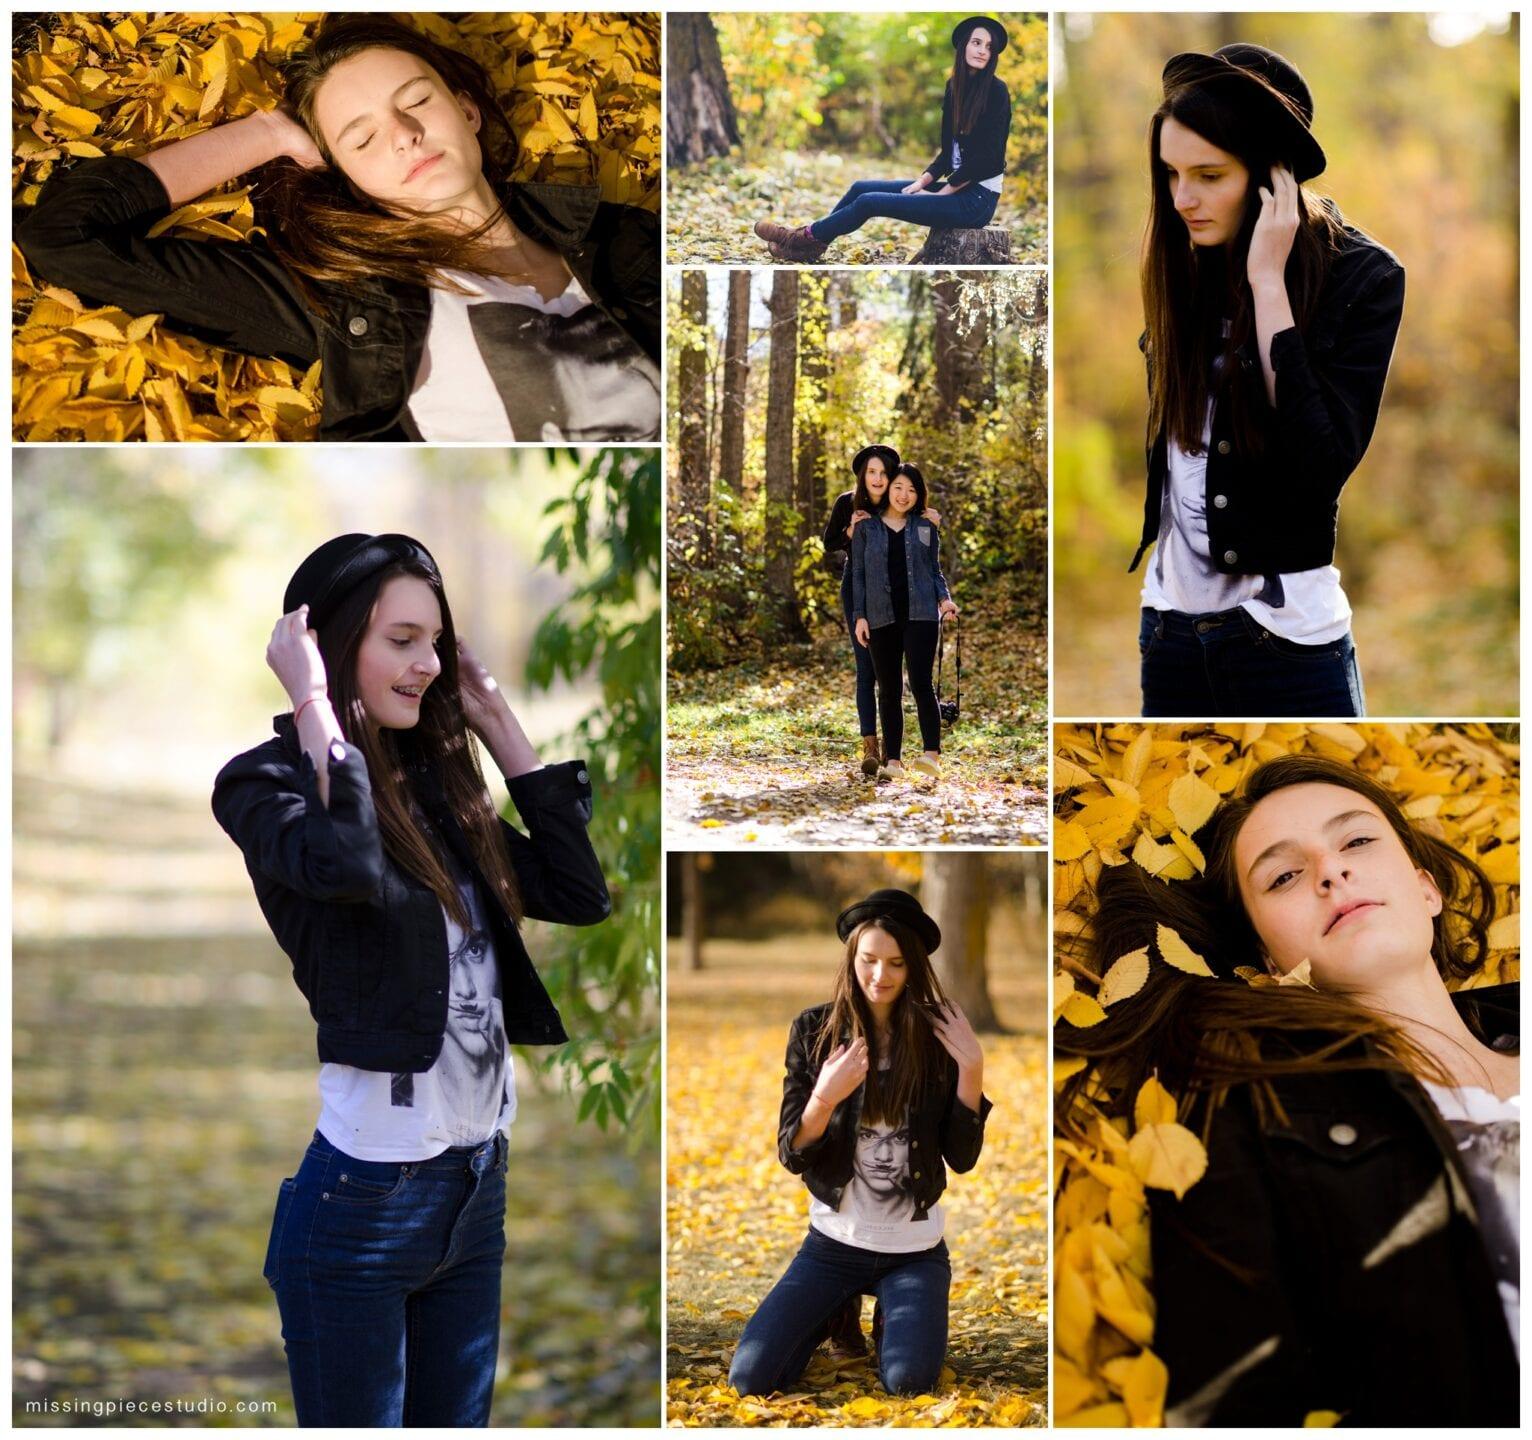 St-Albert-Fall-Portrait-Photography-mpstudio-cover